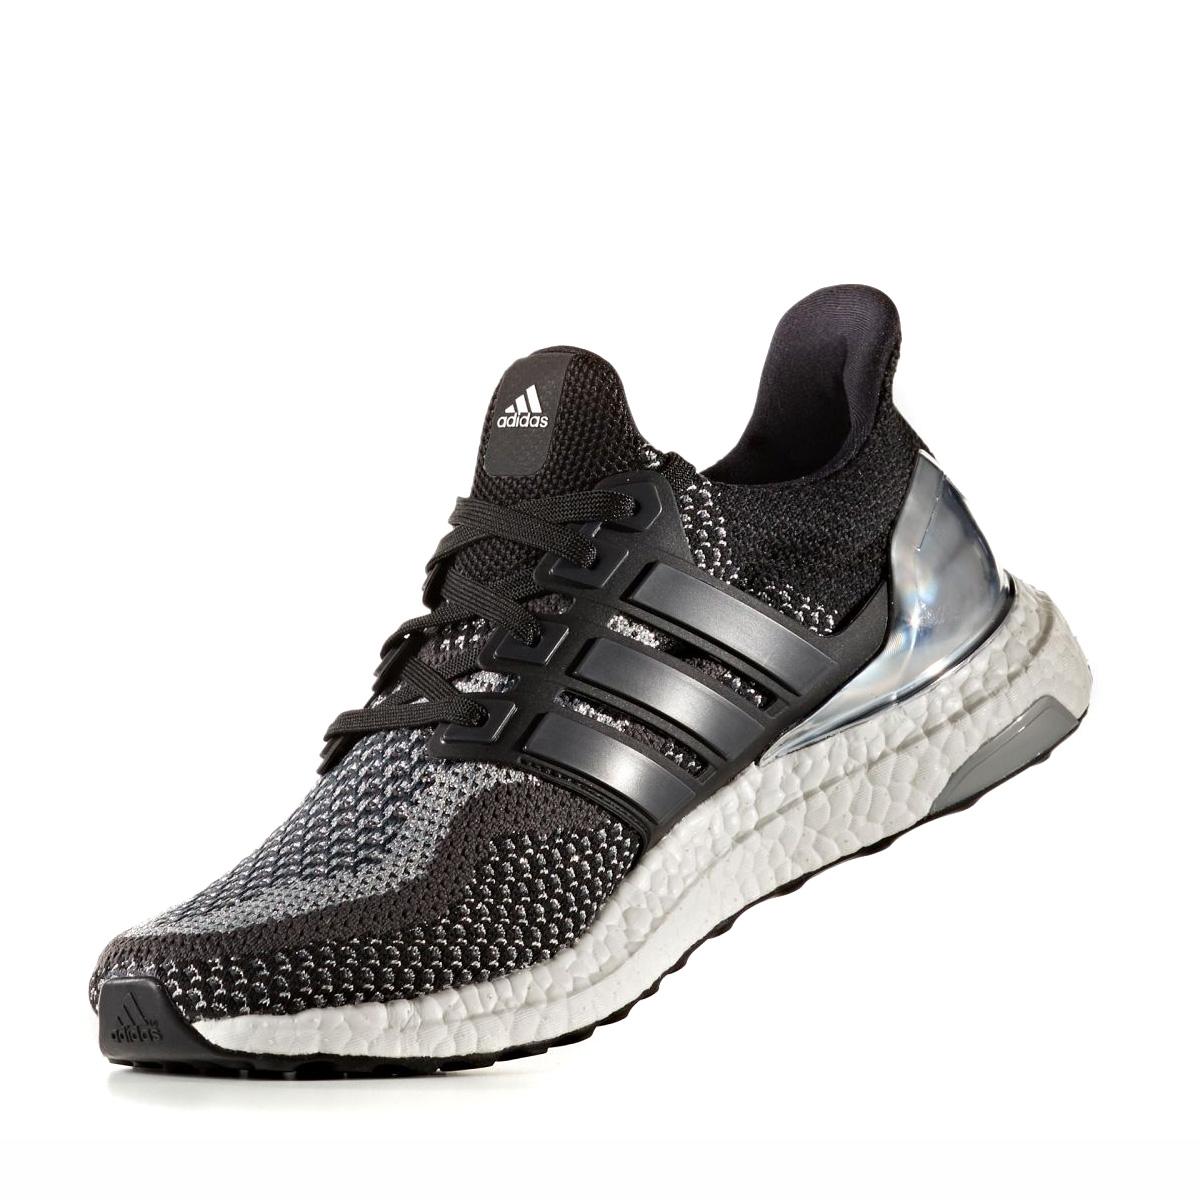 adidas ultra boost Ltd Celeb. (Adidas ultra boost LTD celebrity) CORE  BLACK CORE BLACK SILVER MET 18FW-S 6915ceec6